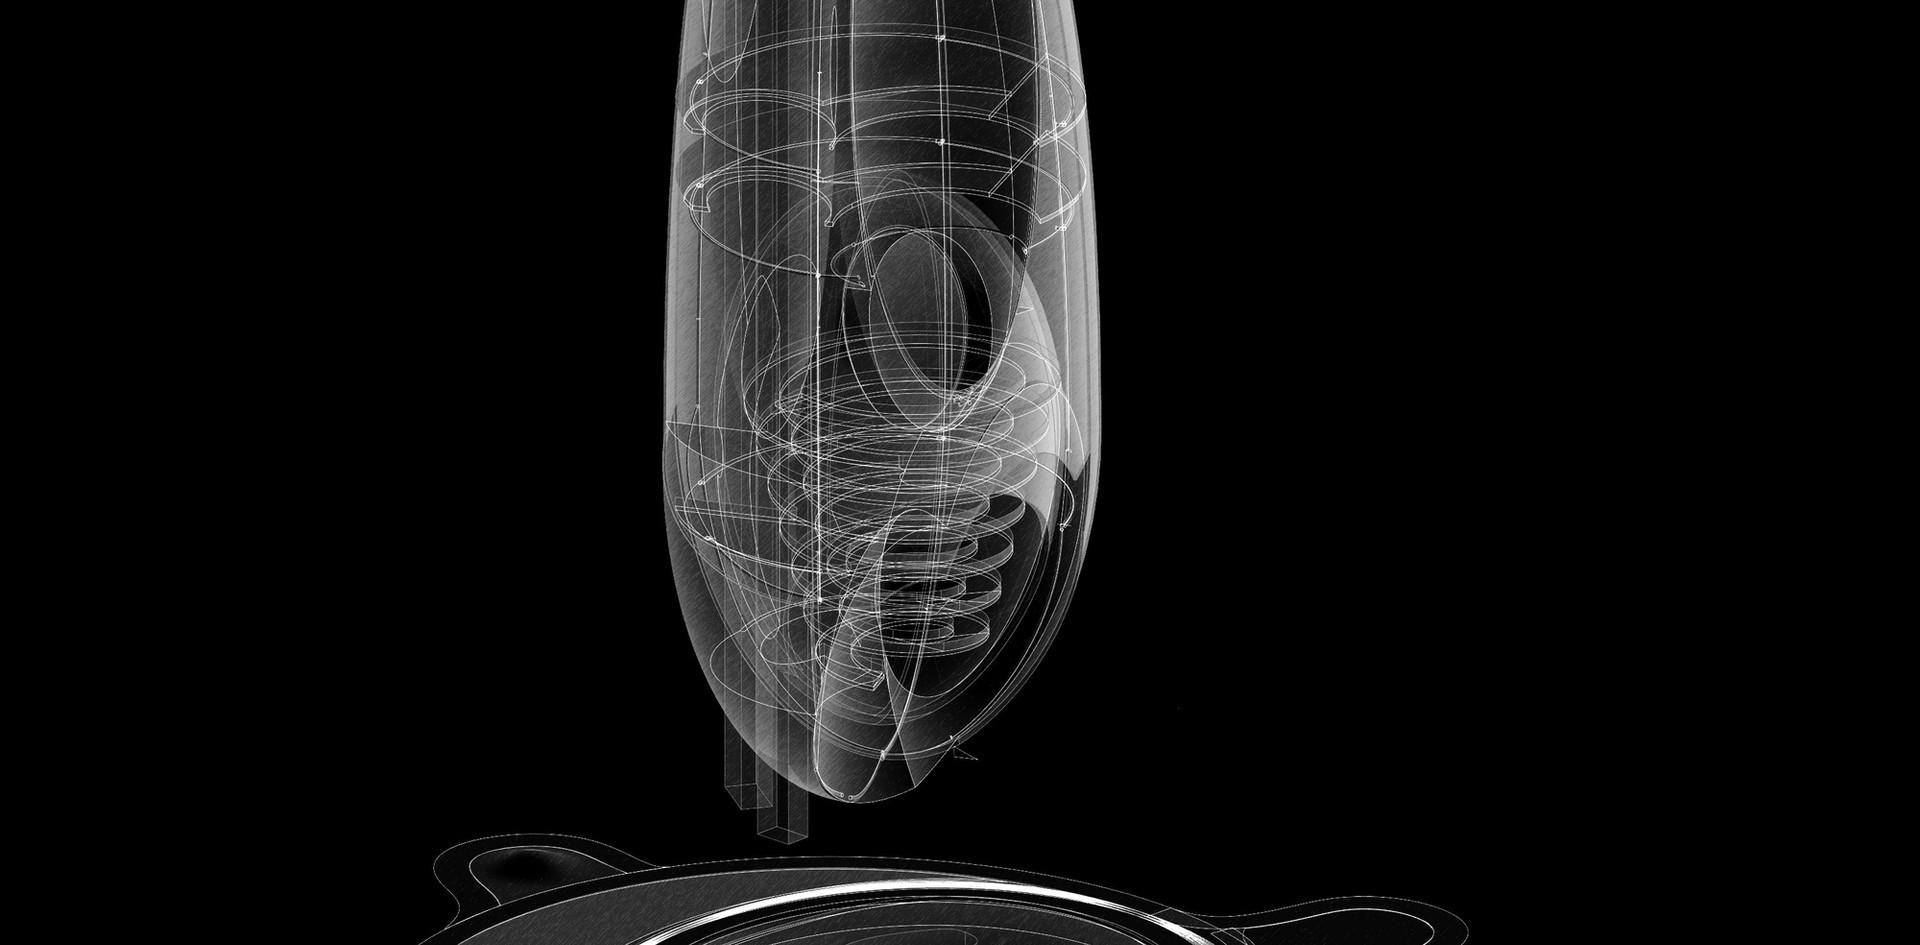 axon-diagram-base.jpg